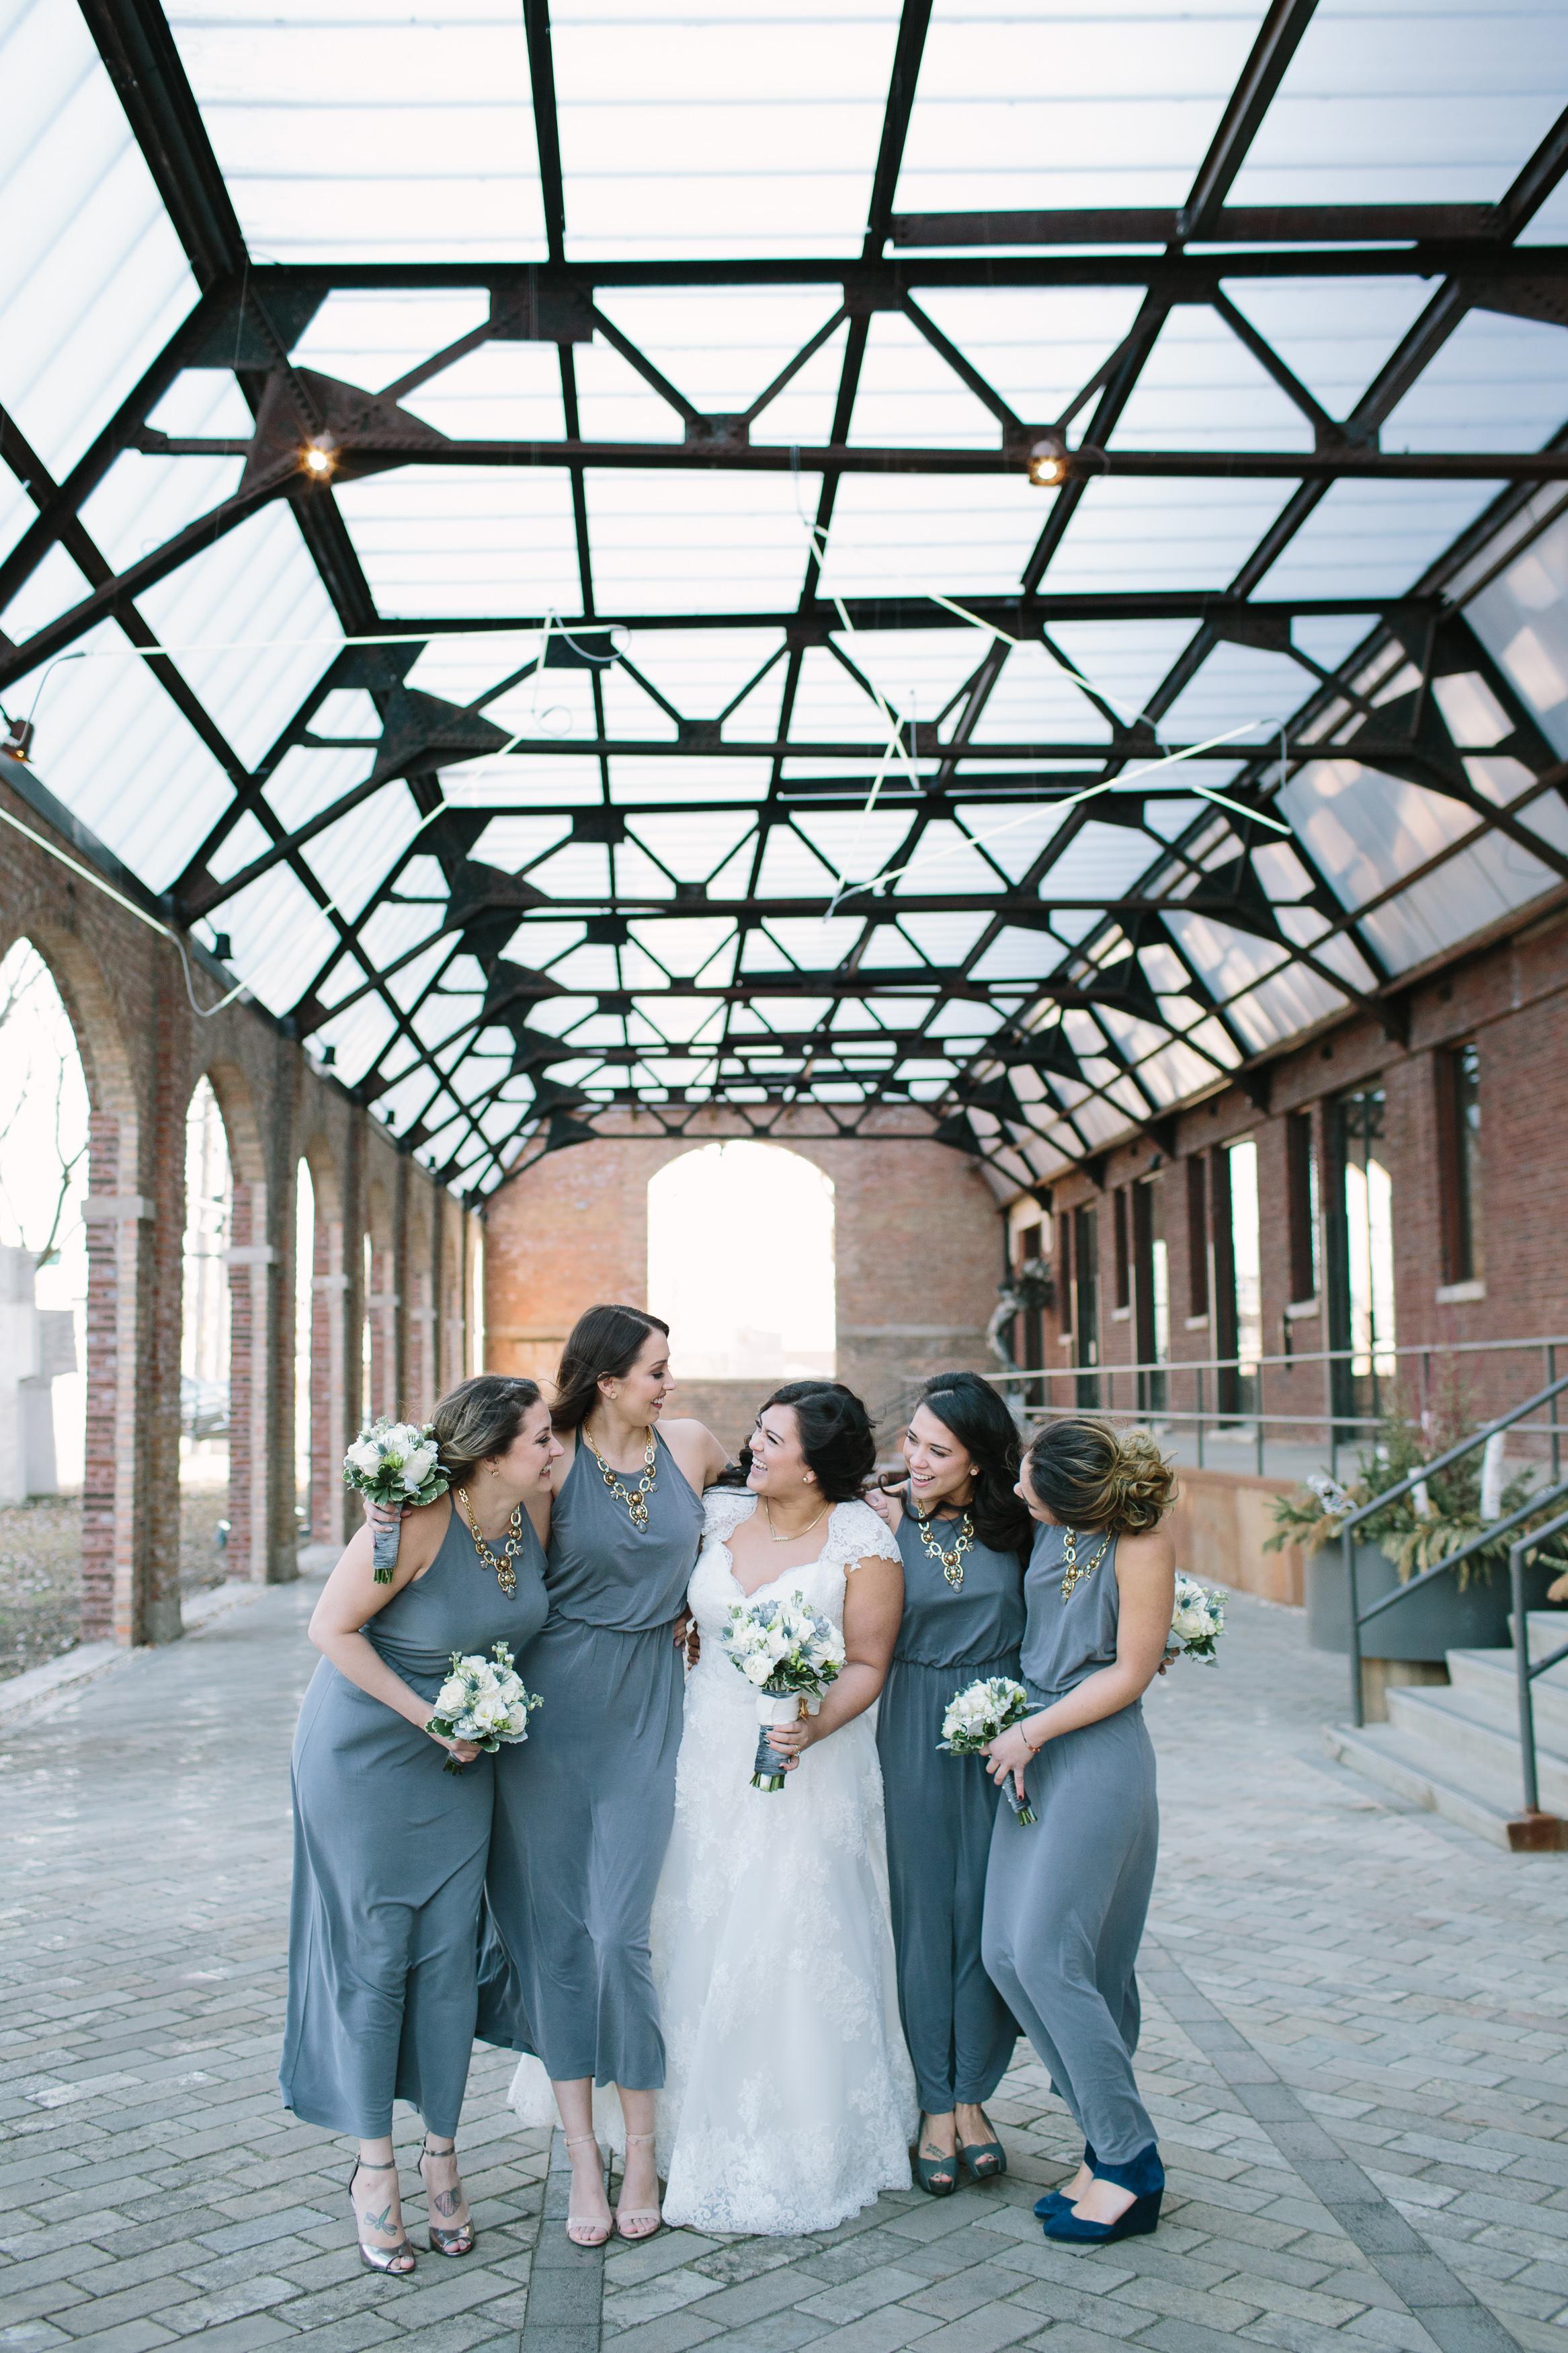 Nicodem Creative_Kerr Wedding_Bridgeport Art Center Chicago-12.jpg